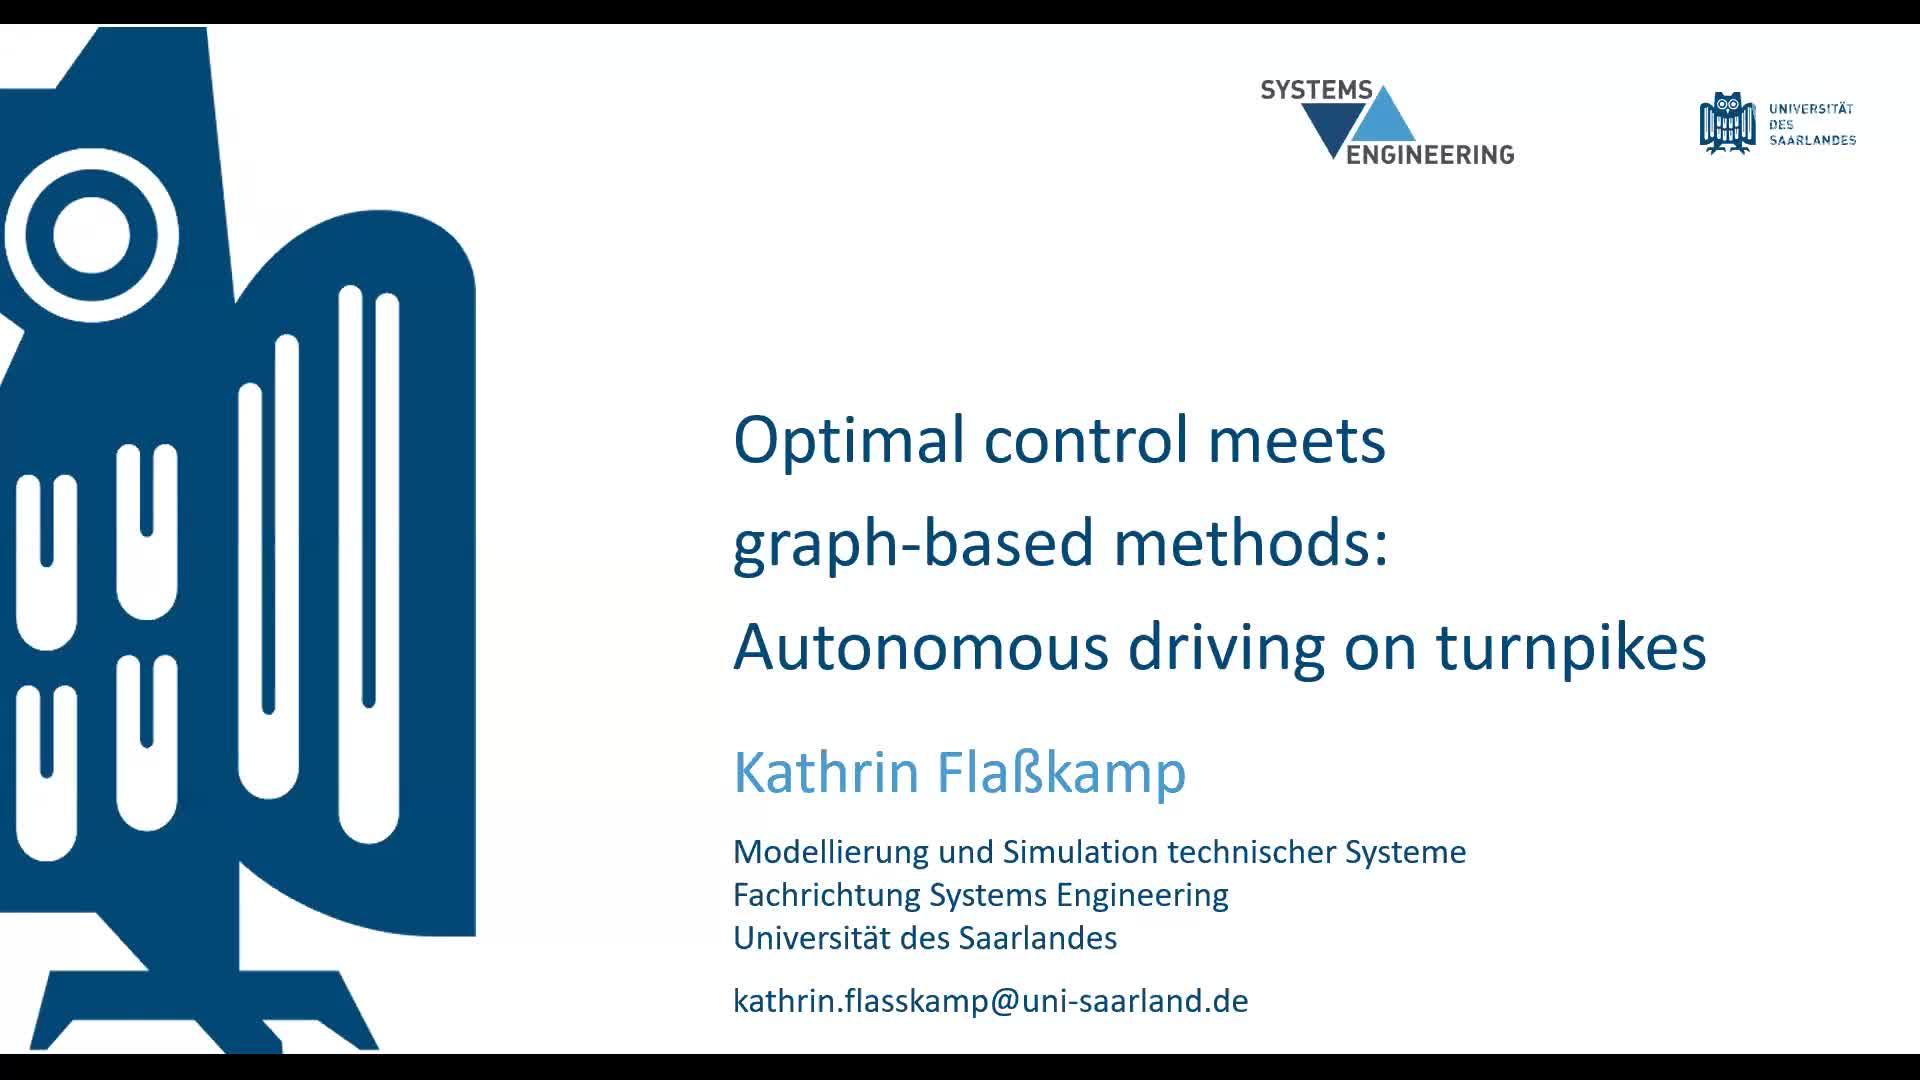 Optimal control meets graph-based methods: Autonomous driving on turnpikes (K. Flaßkamp) preview image